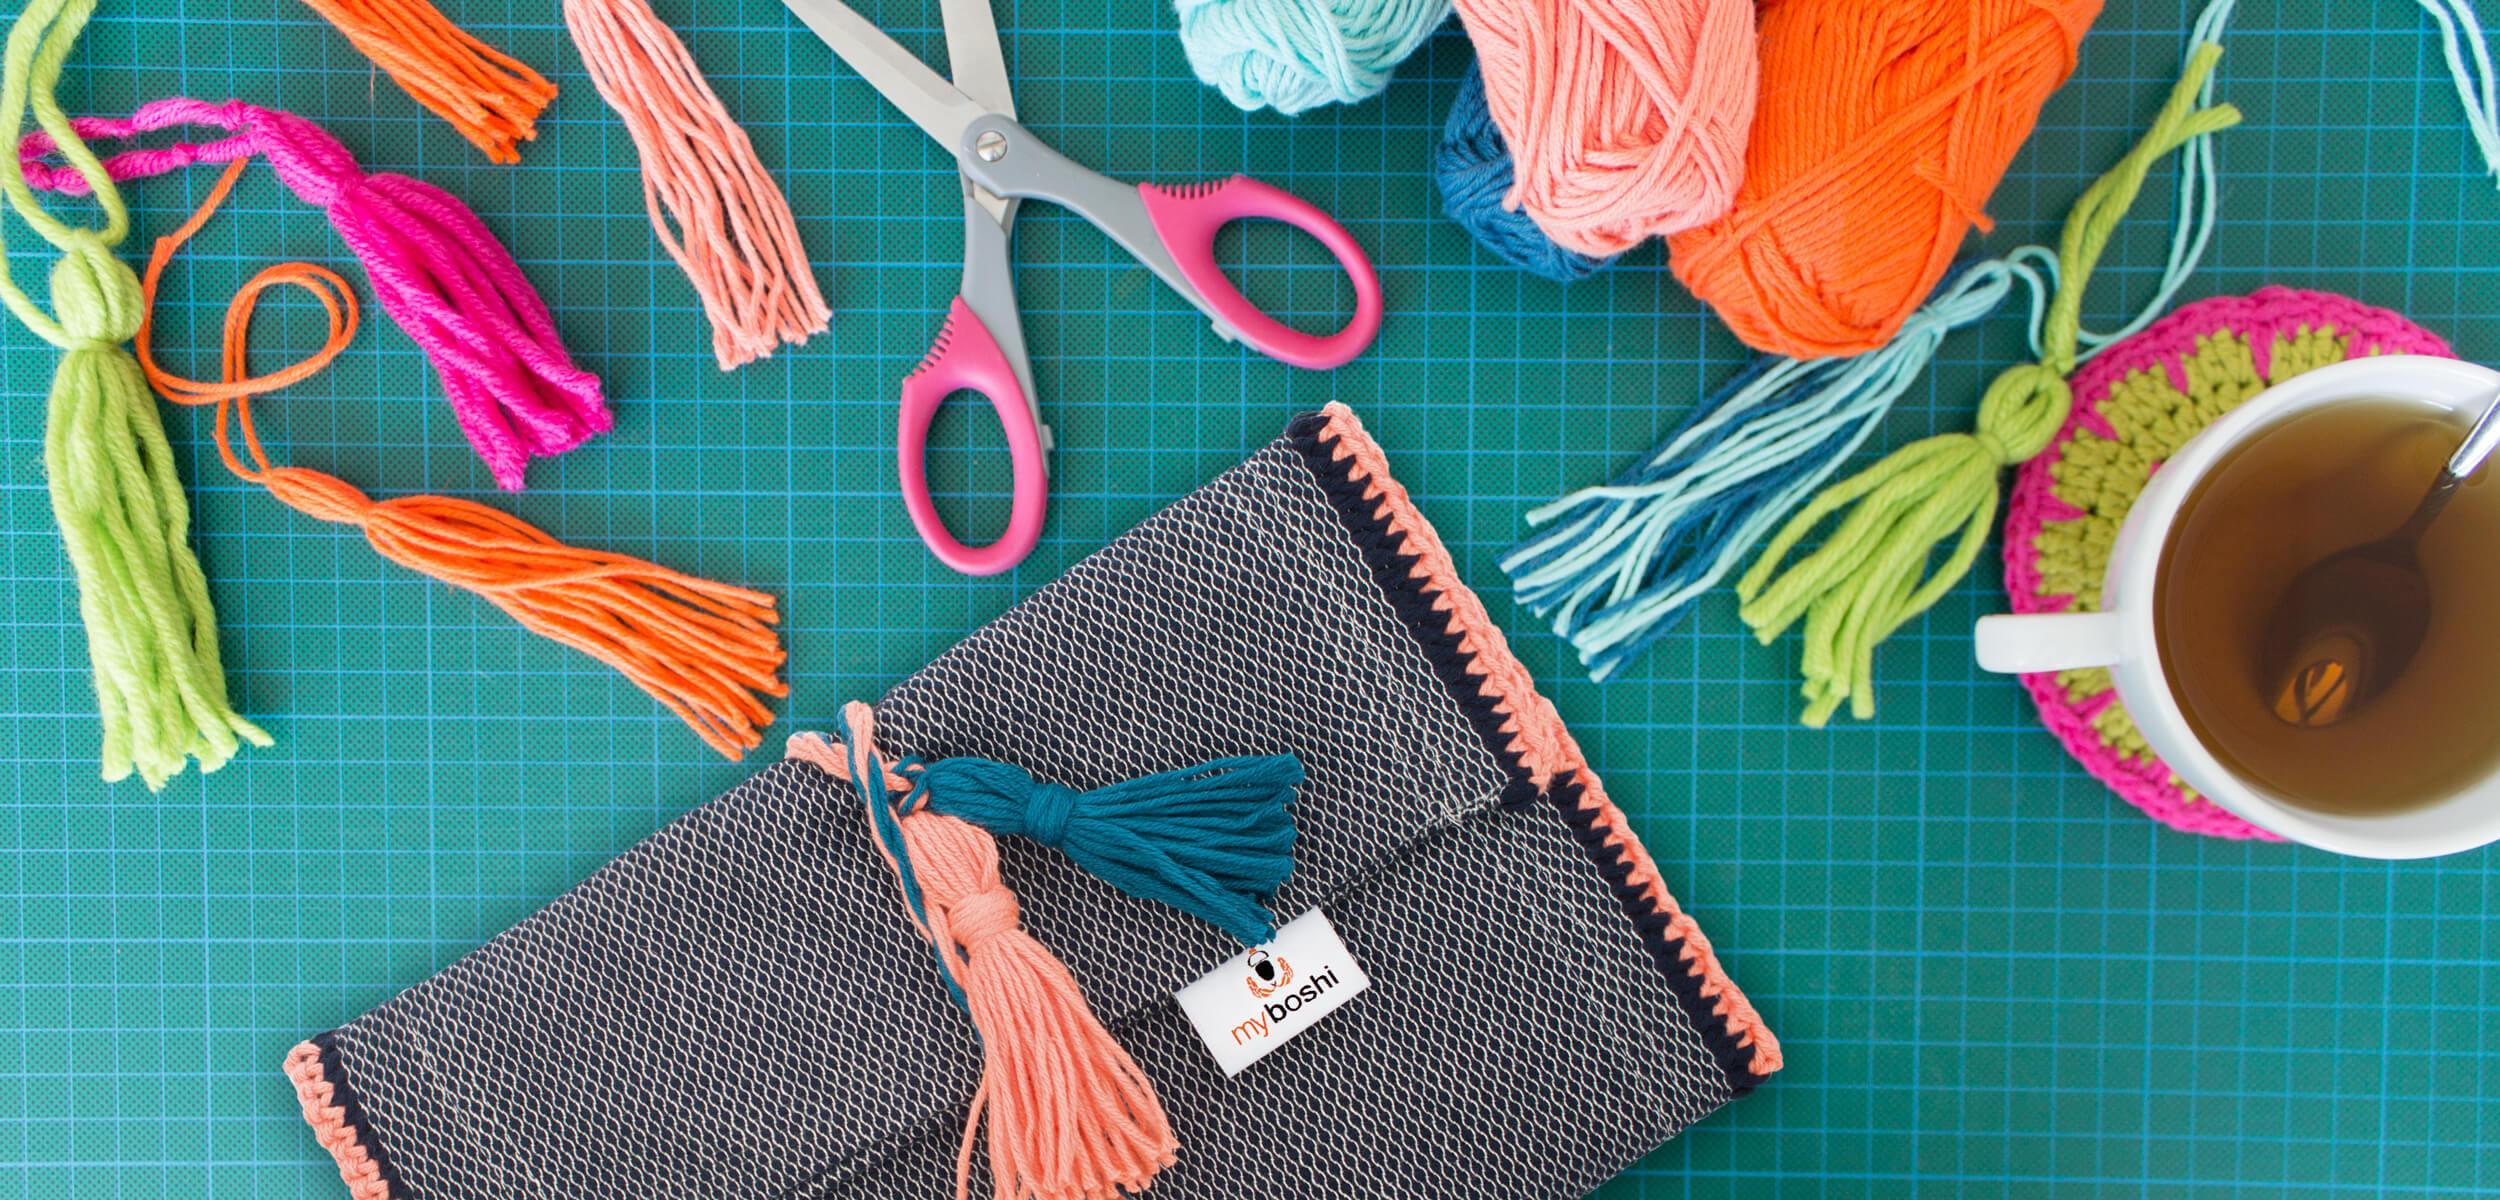 Diy Wolle  DIY Tipp Quasten selber machen myboshi Blog häkeln